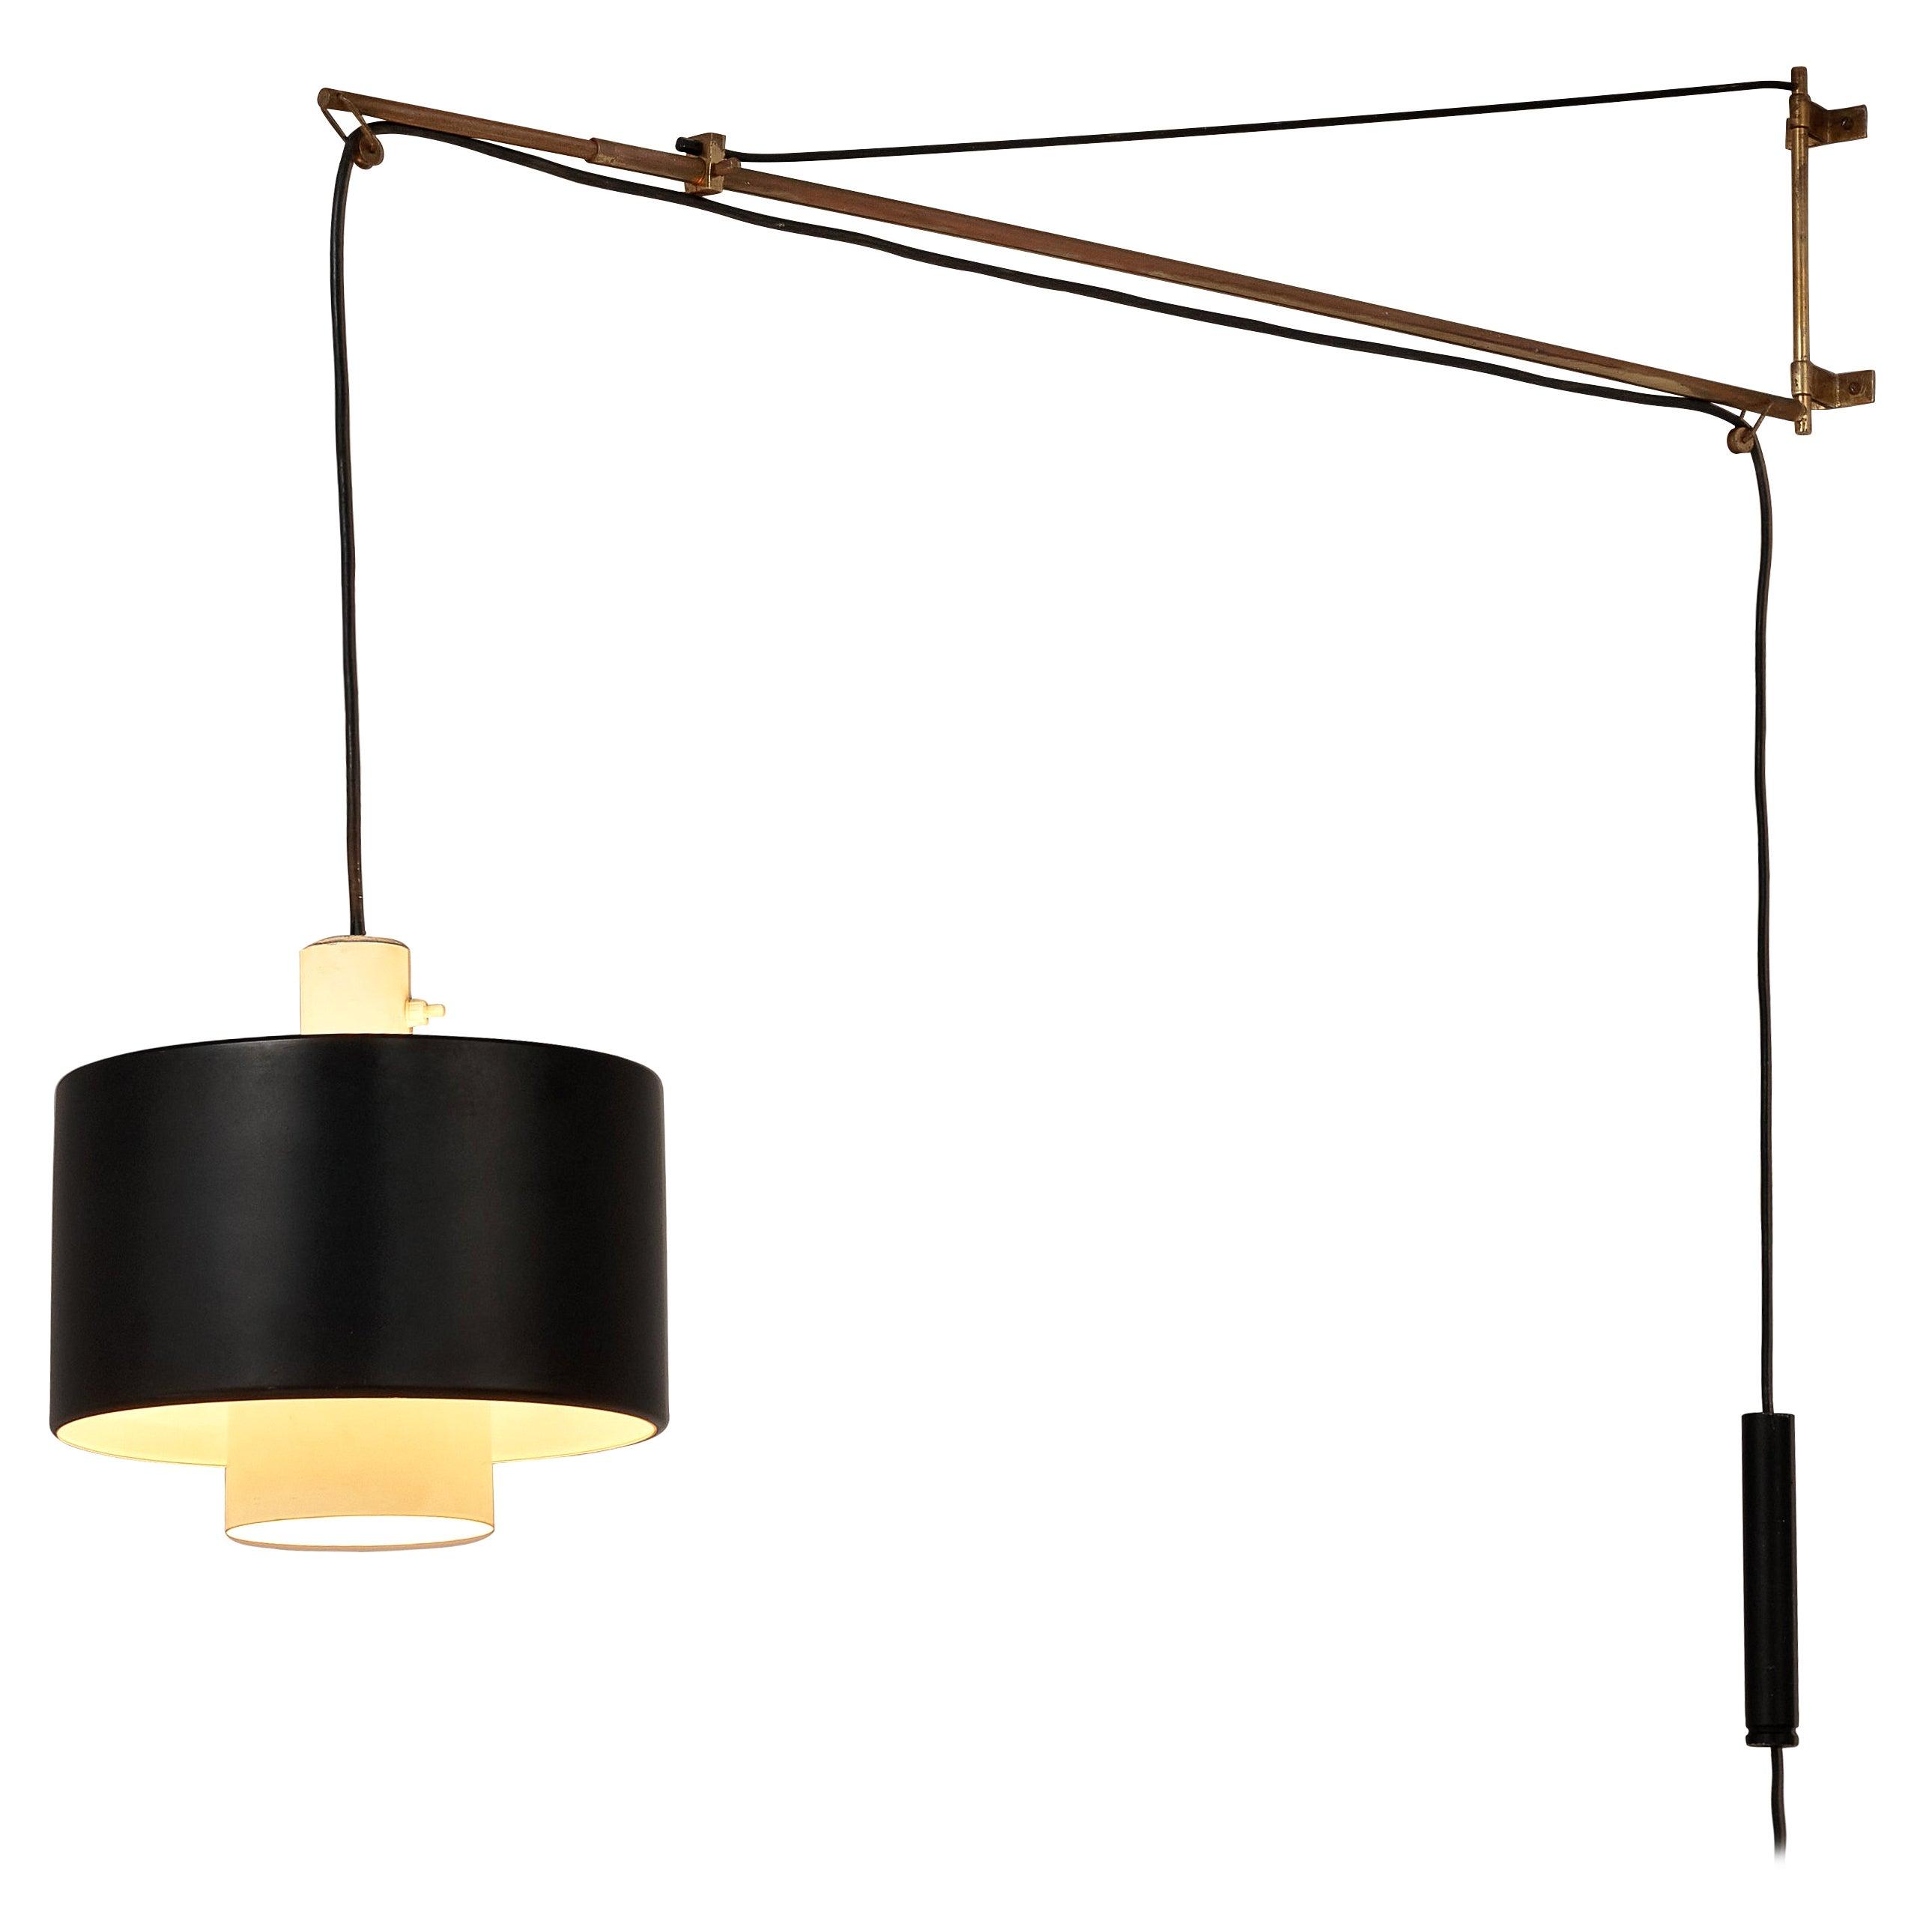 Early Gaetano Sciolari for Stilnovo Wall-Mounted Pendant Lamp Model '2061'